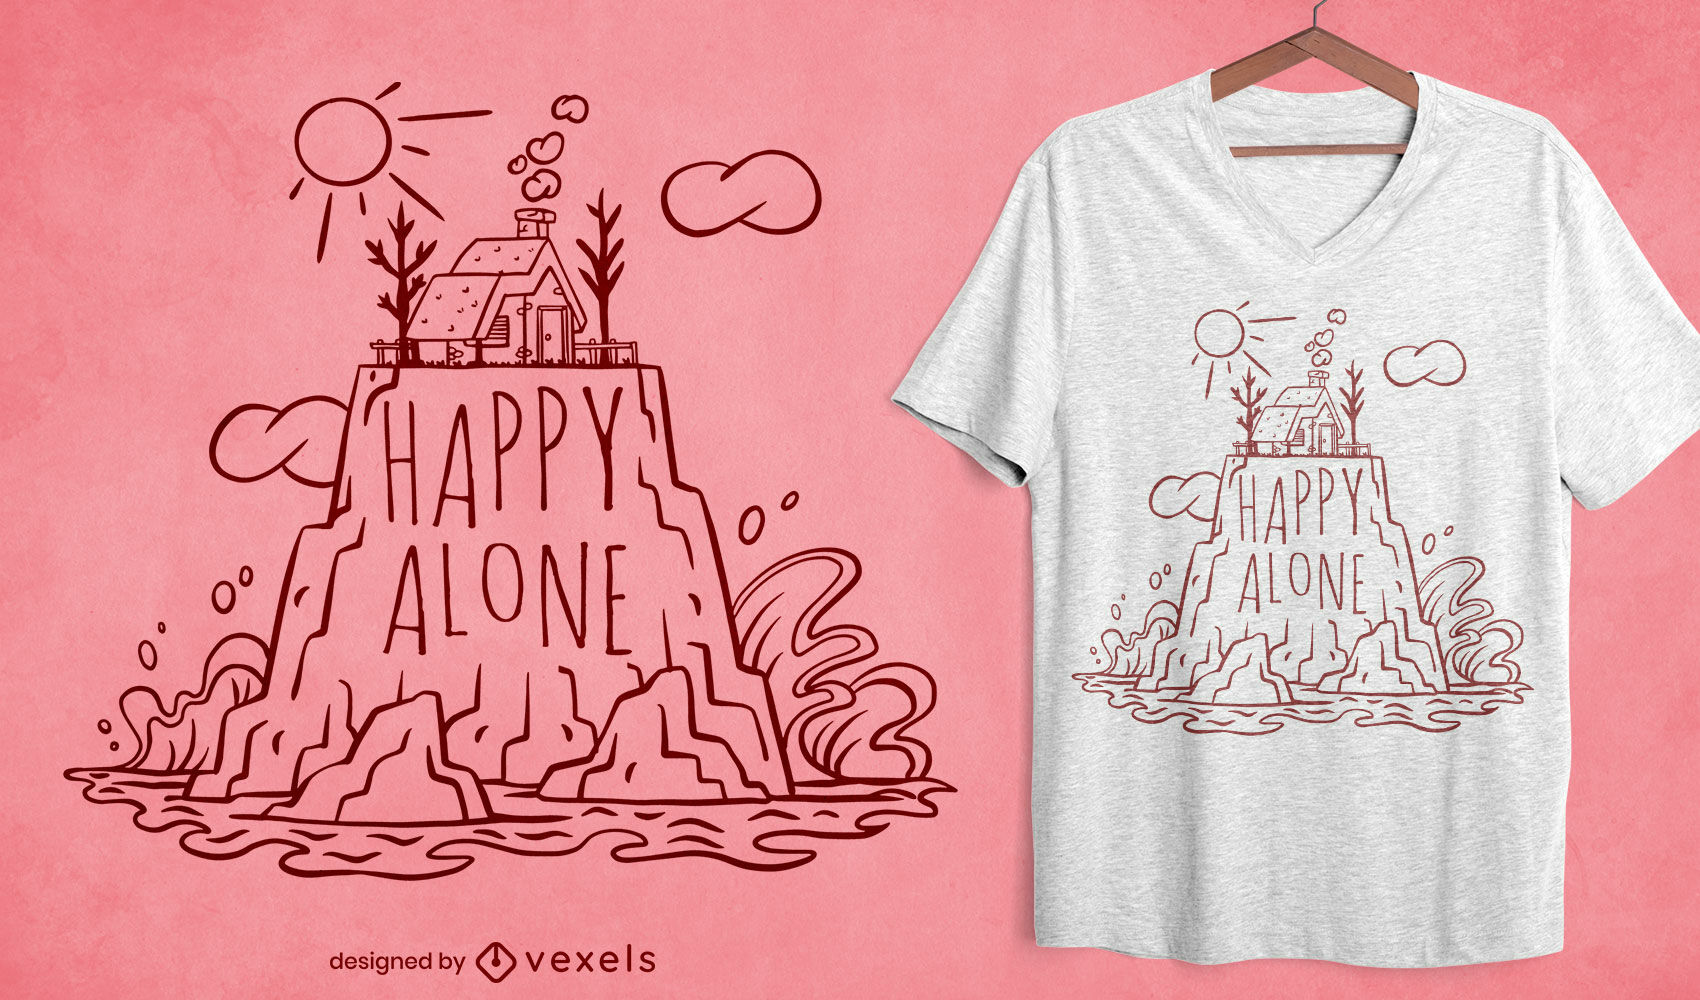 Alone house t-shirt design